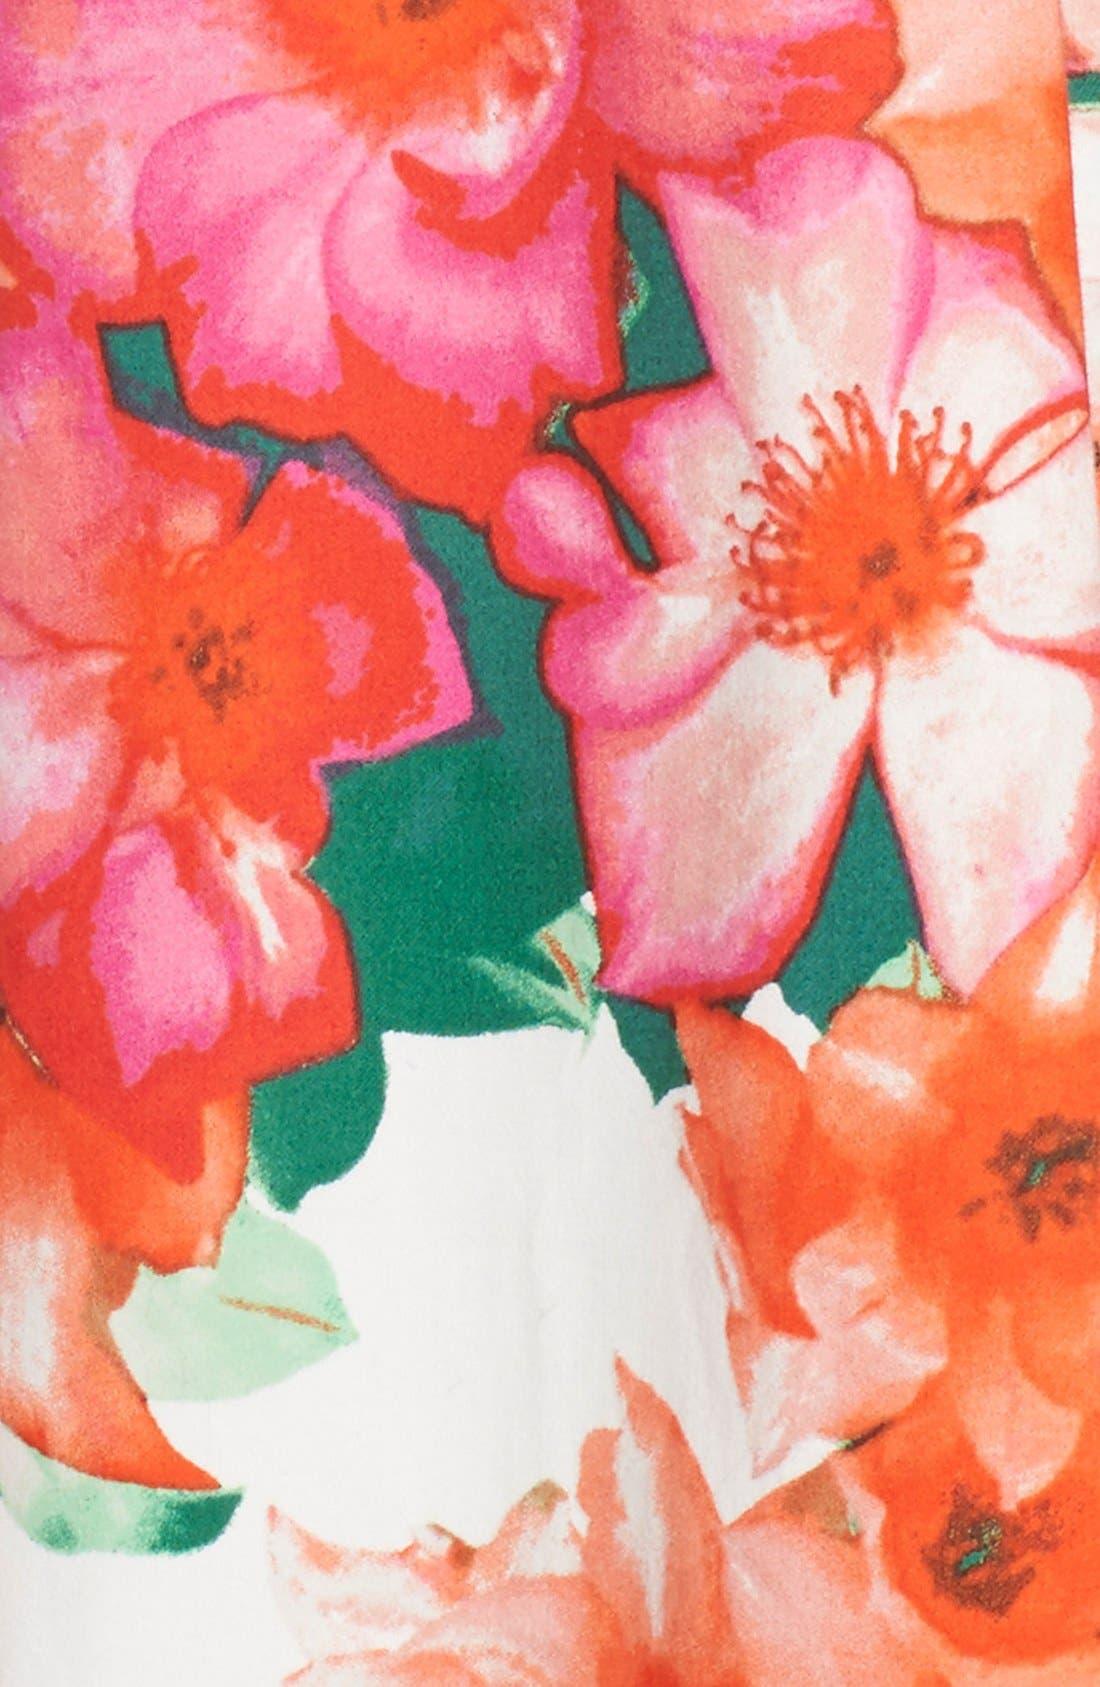 Floral Print Fit & Flare Dress,                             Alternate thumbnail 5, color,                             Pink/ Orange/ Green